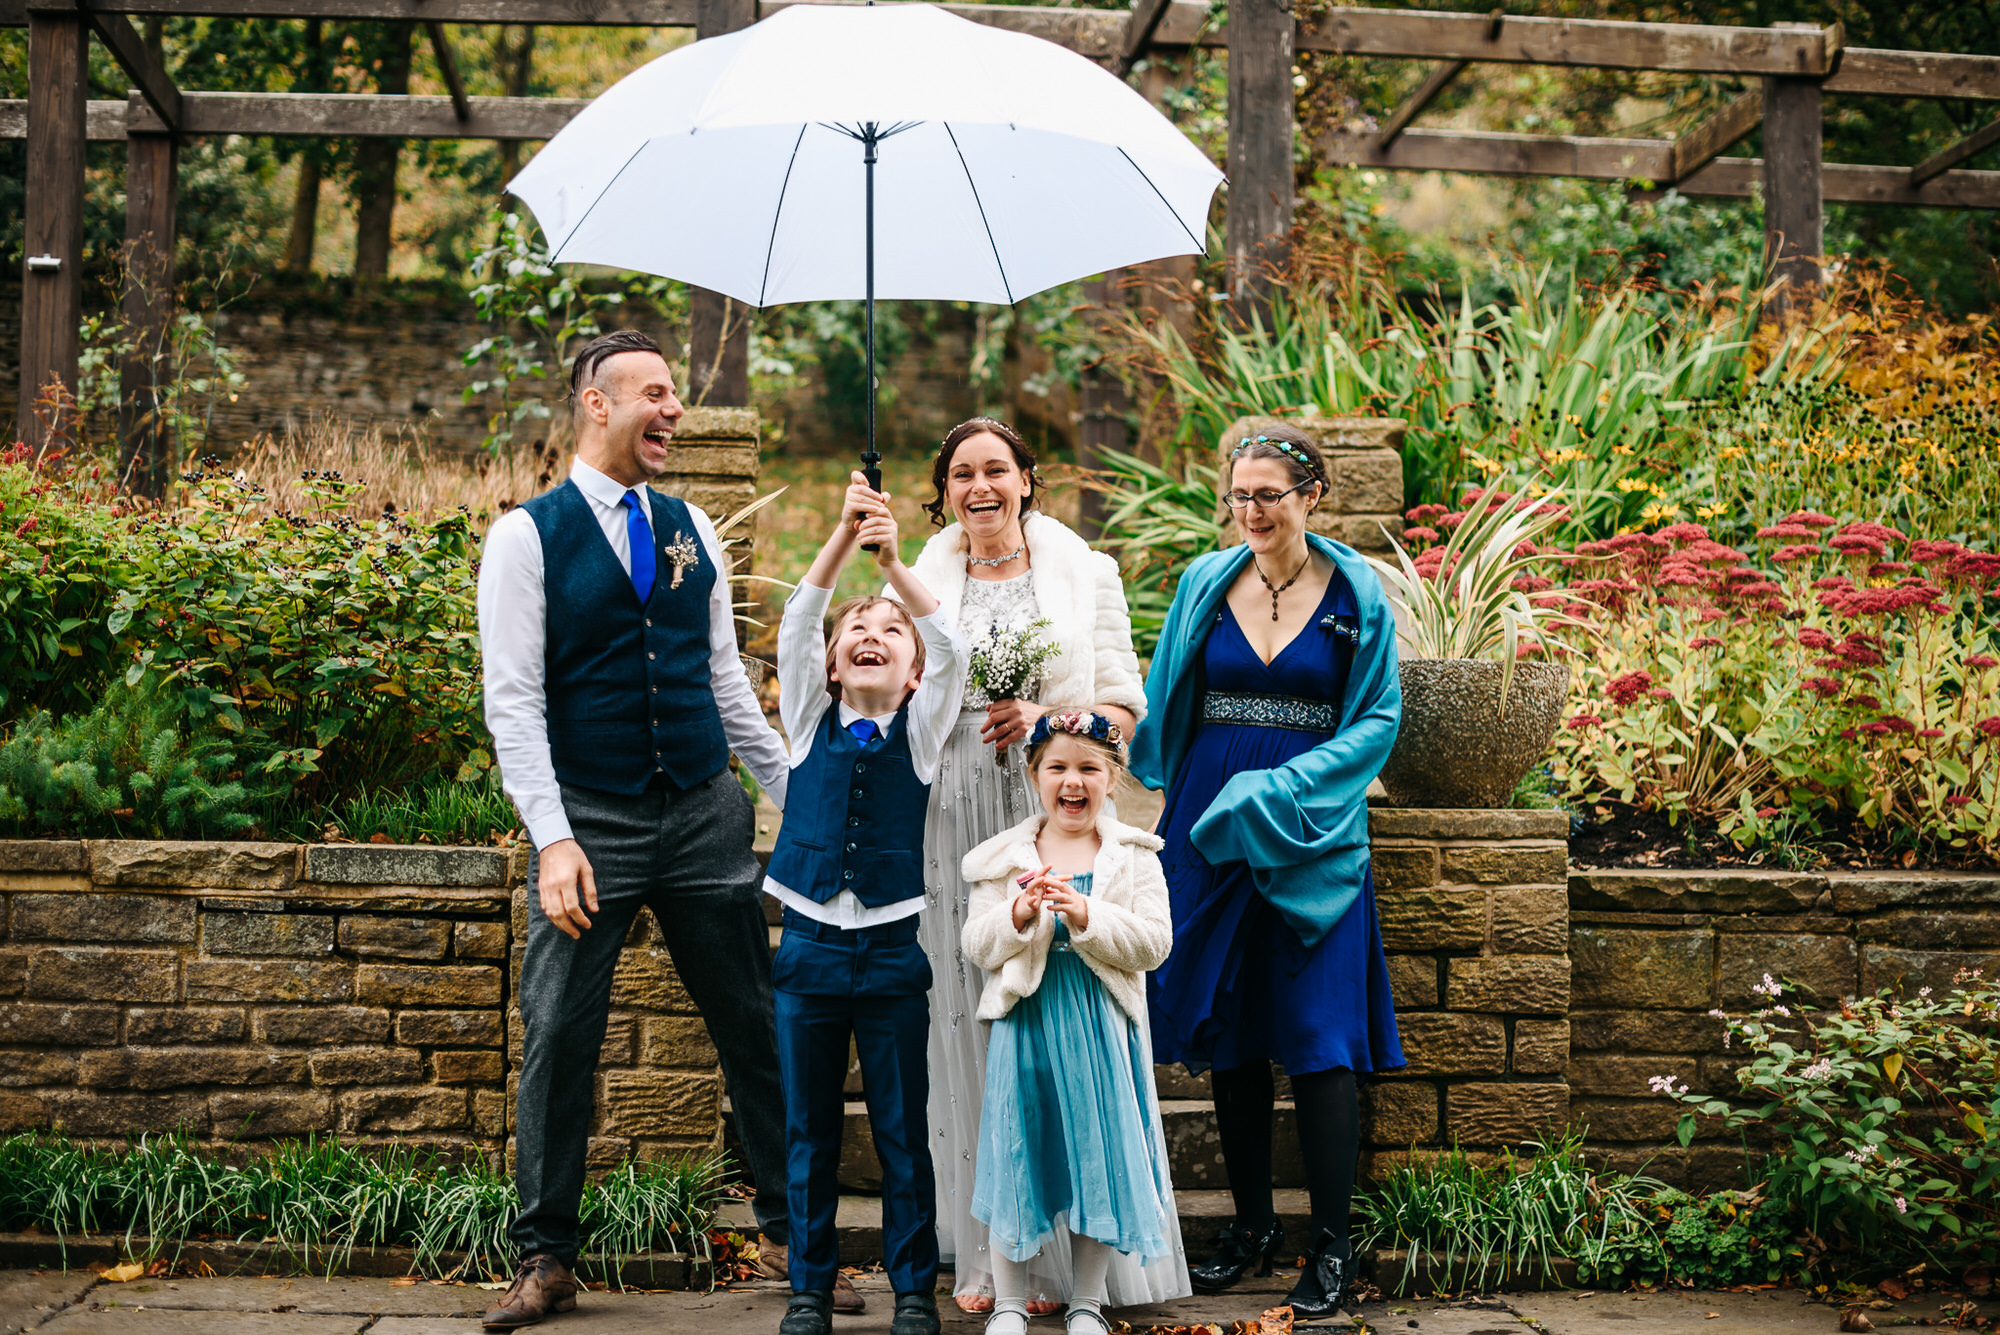 Best Of Yorkshire Wedding Photography 2017 - Martyn Hand-25.jpg